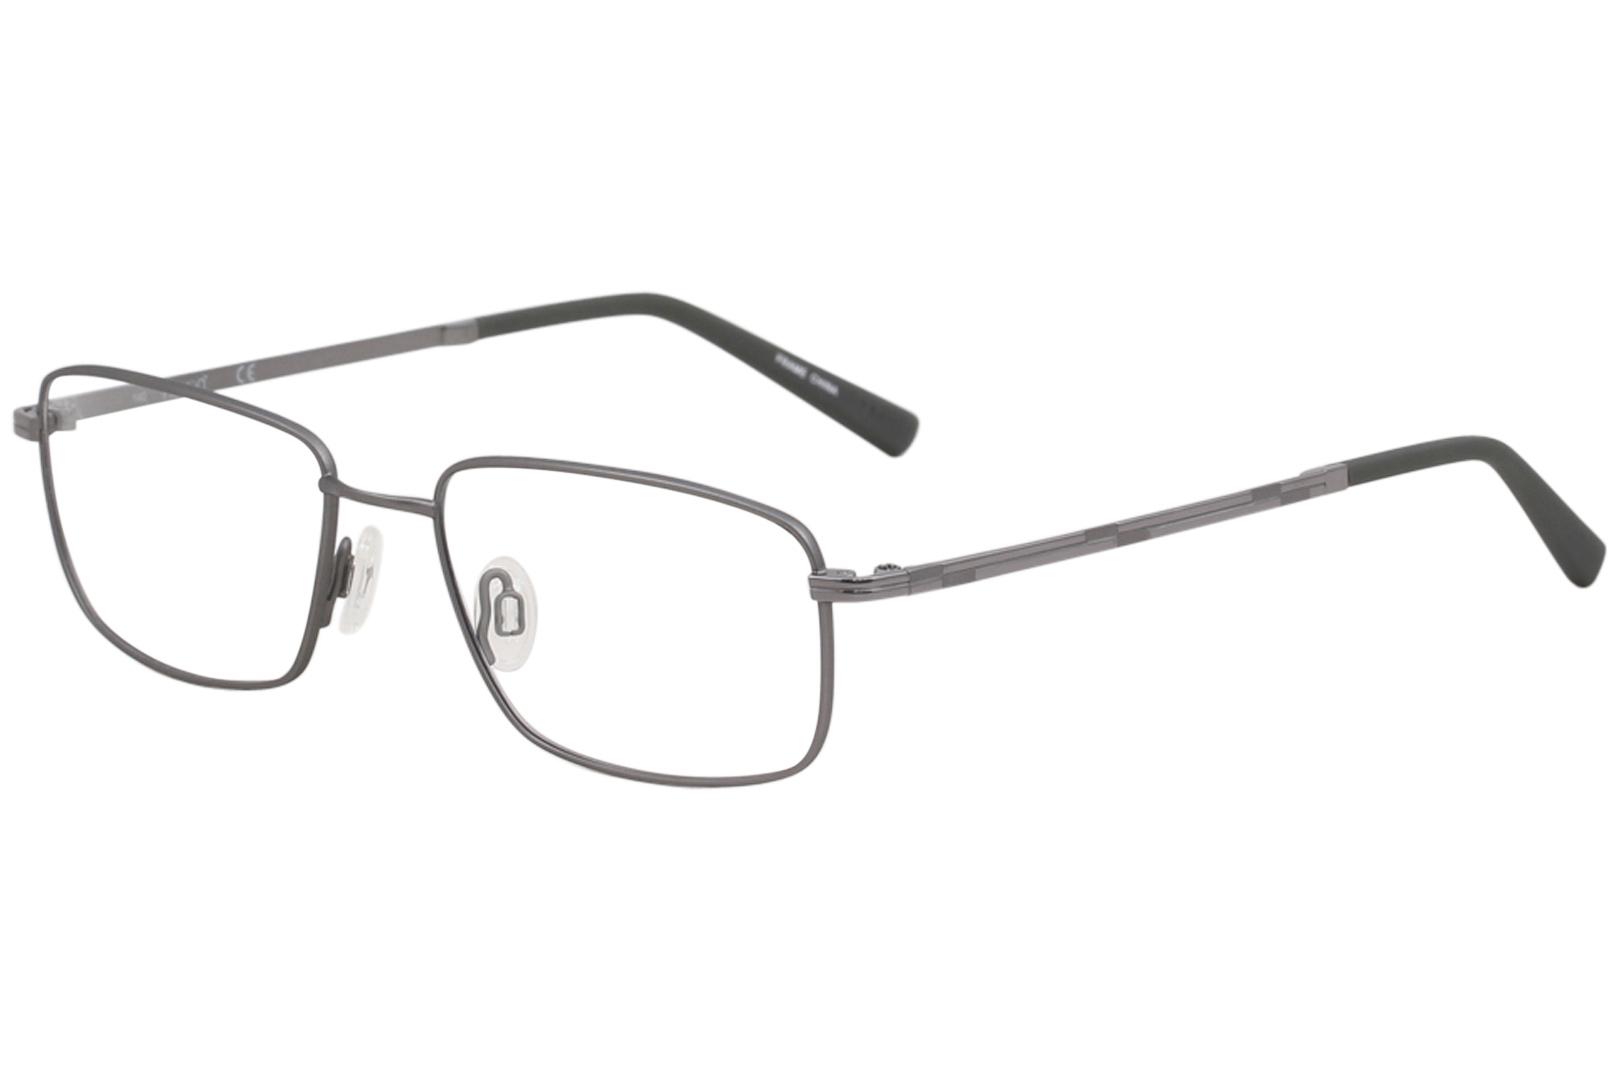 8655e170dea Flexon Men s Eyeglasses Nathaniel 600 035 Slate Full Rim Optical ...